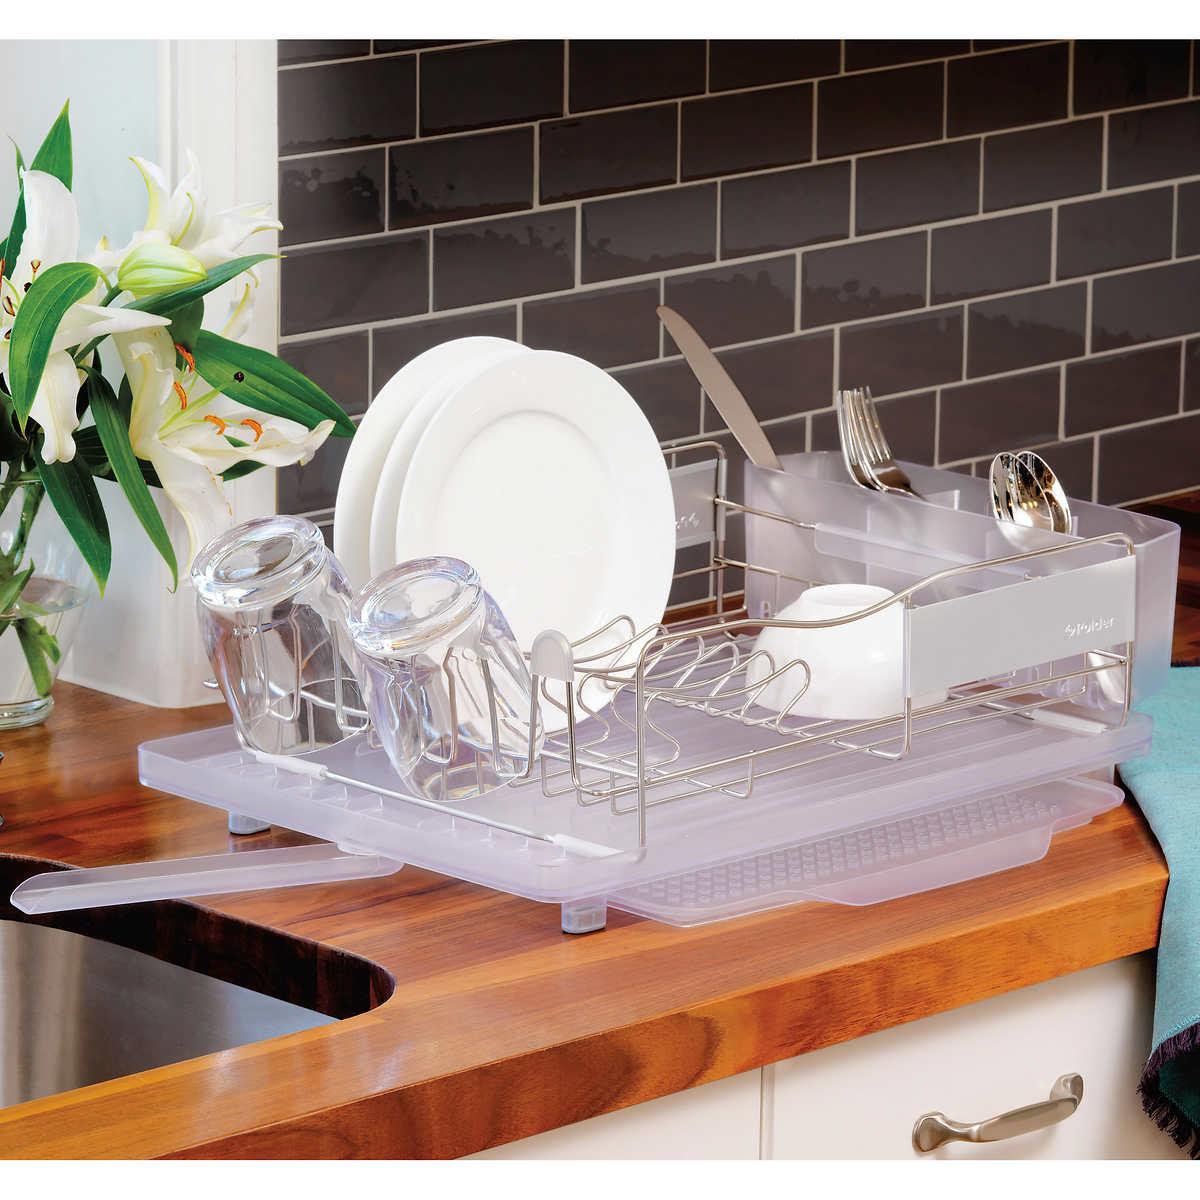 Dish Rack.Polder Stainless Steel Dish Rack